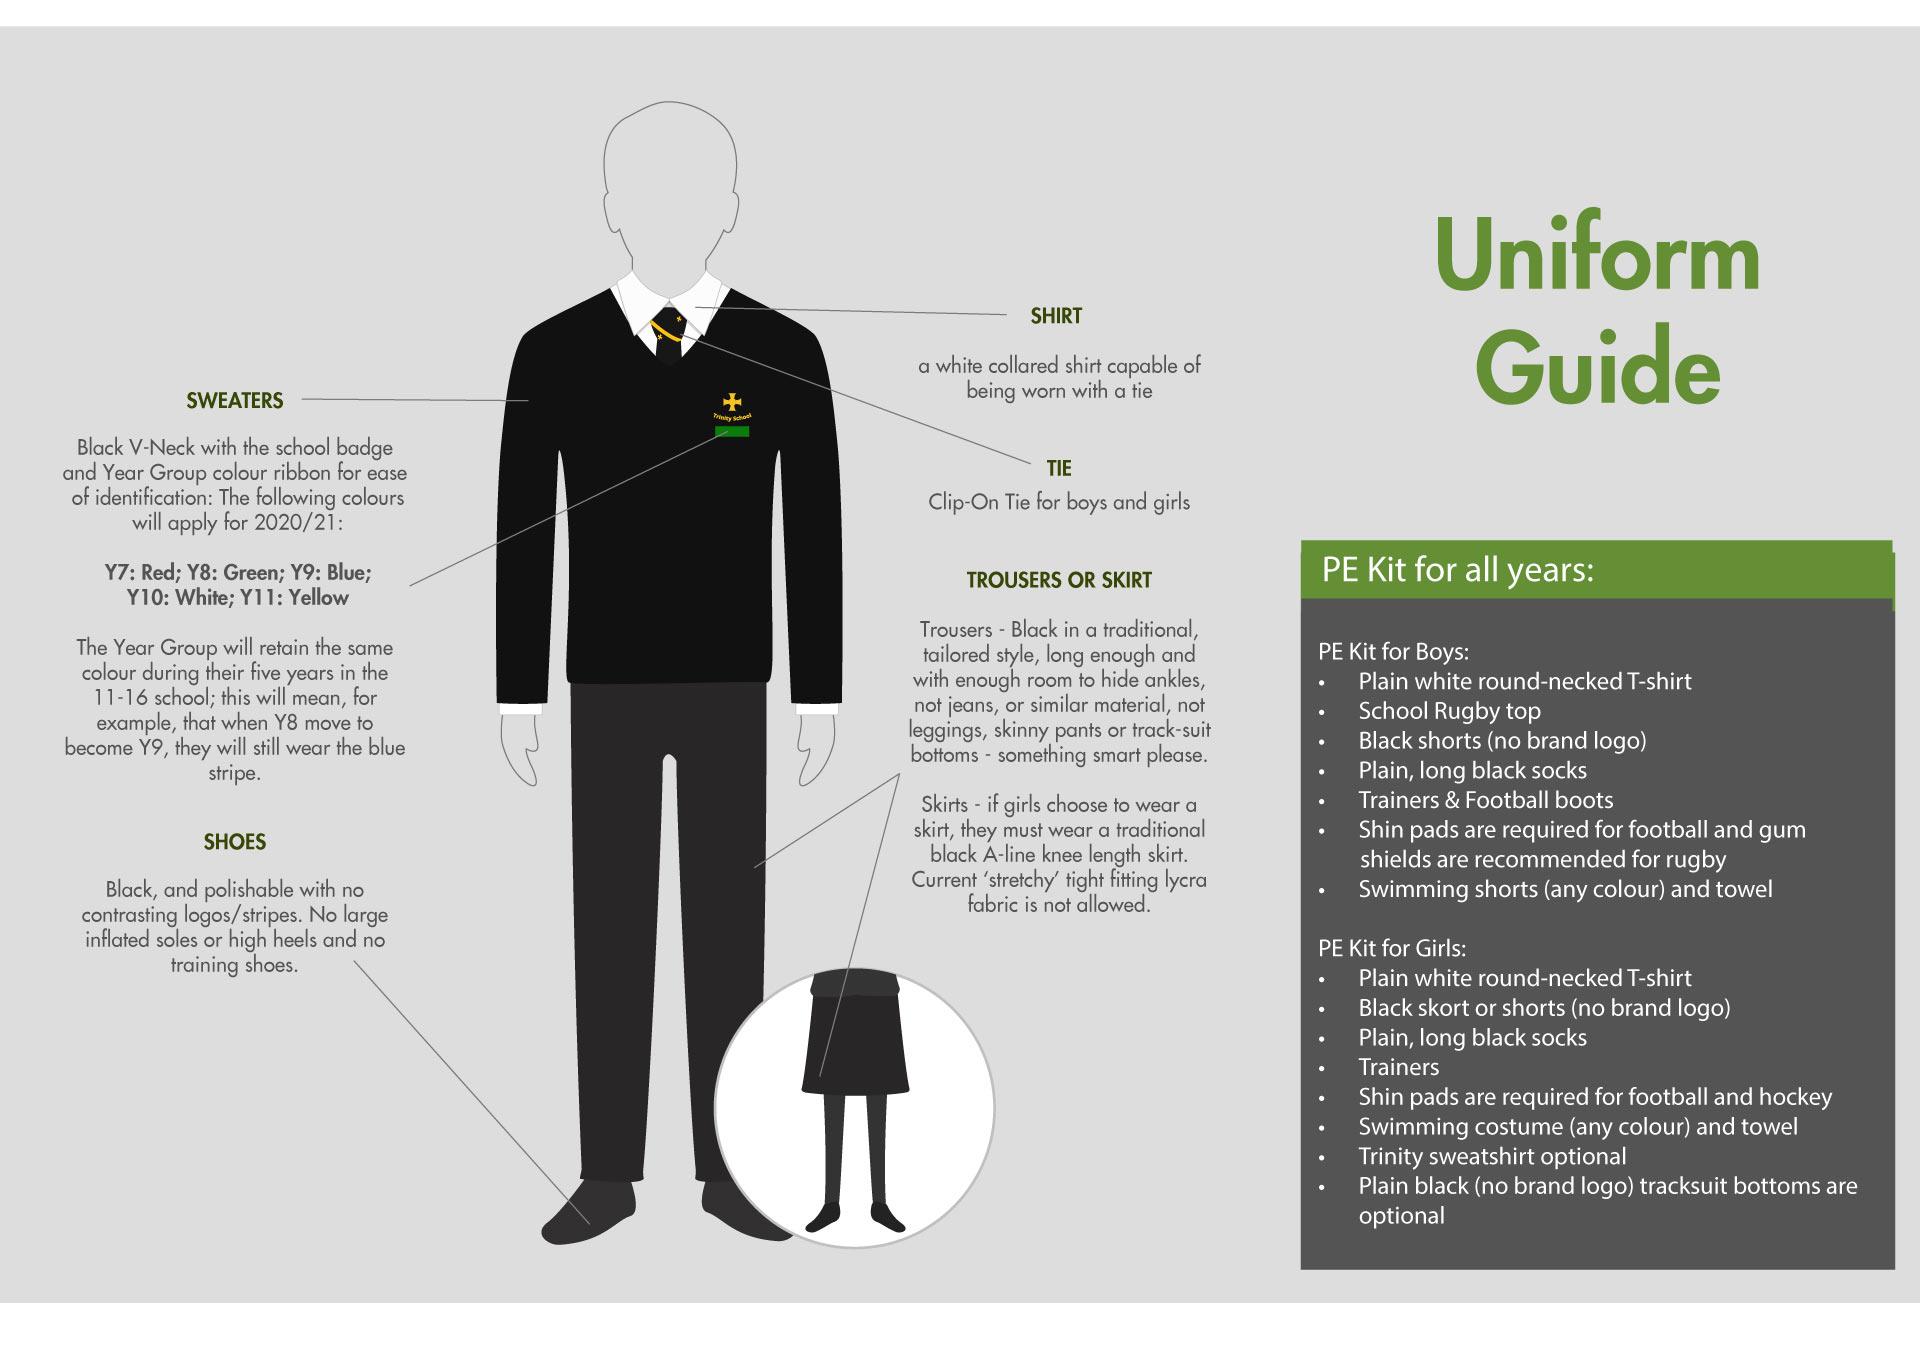 uniform-image-2020-21